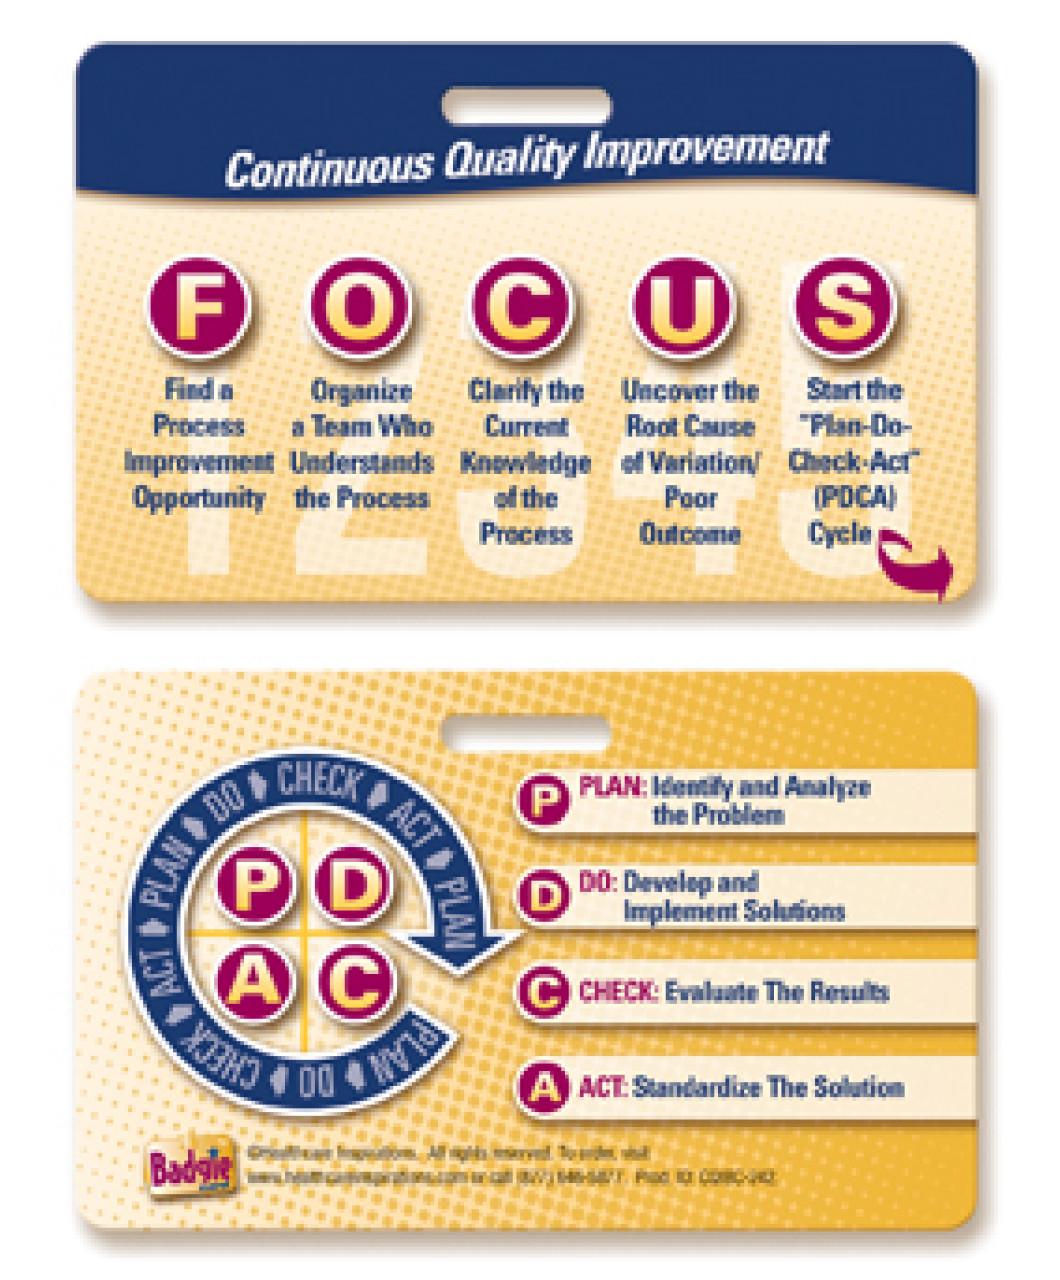 Focus Pdca Badgie Card